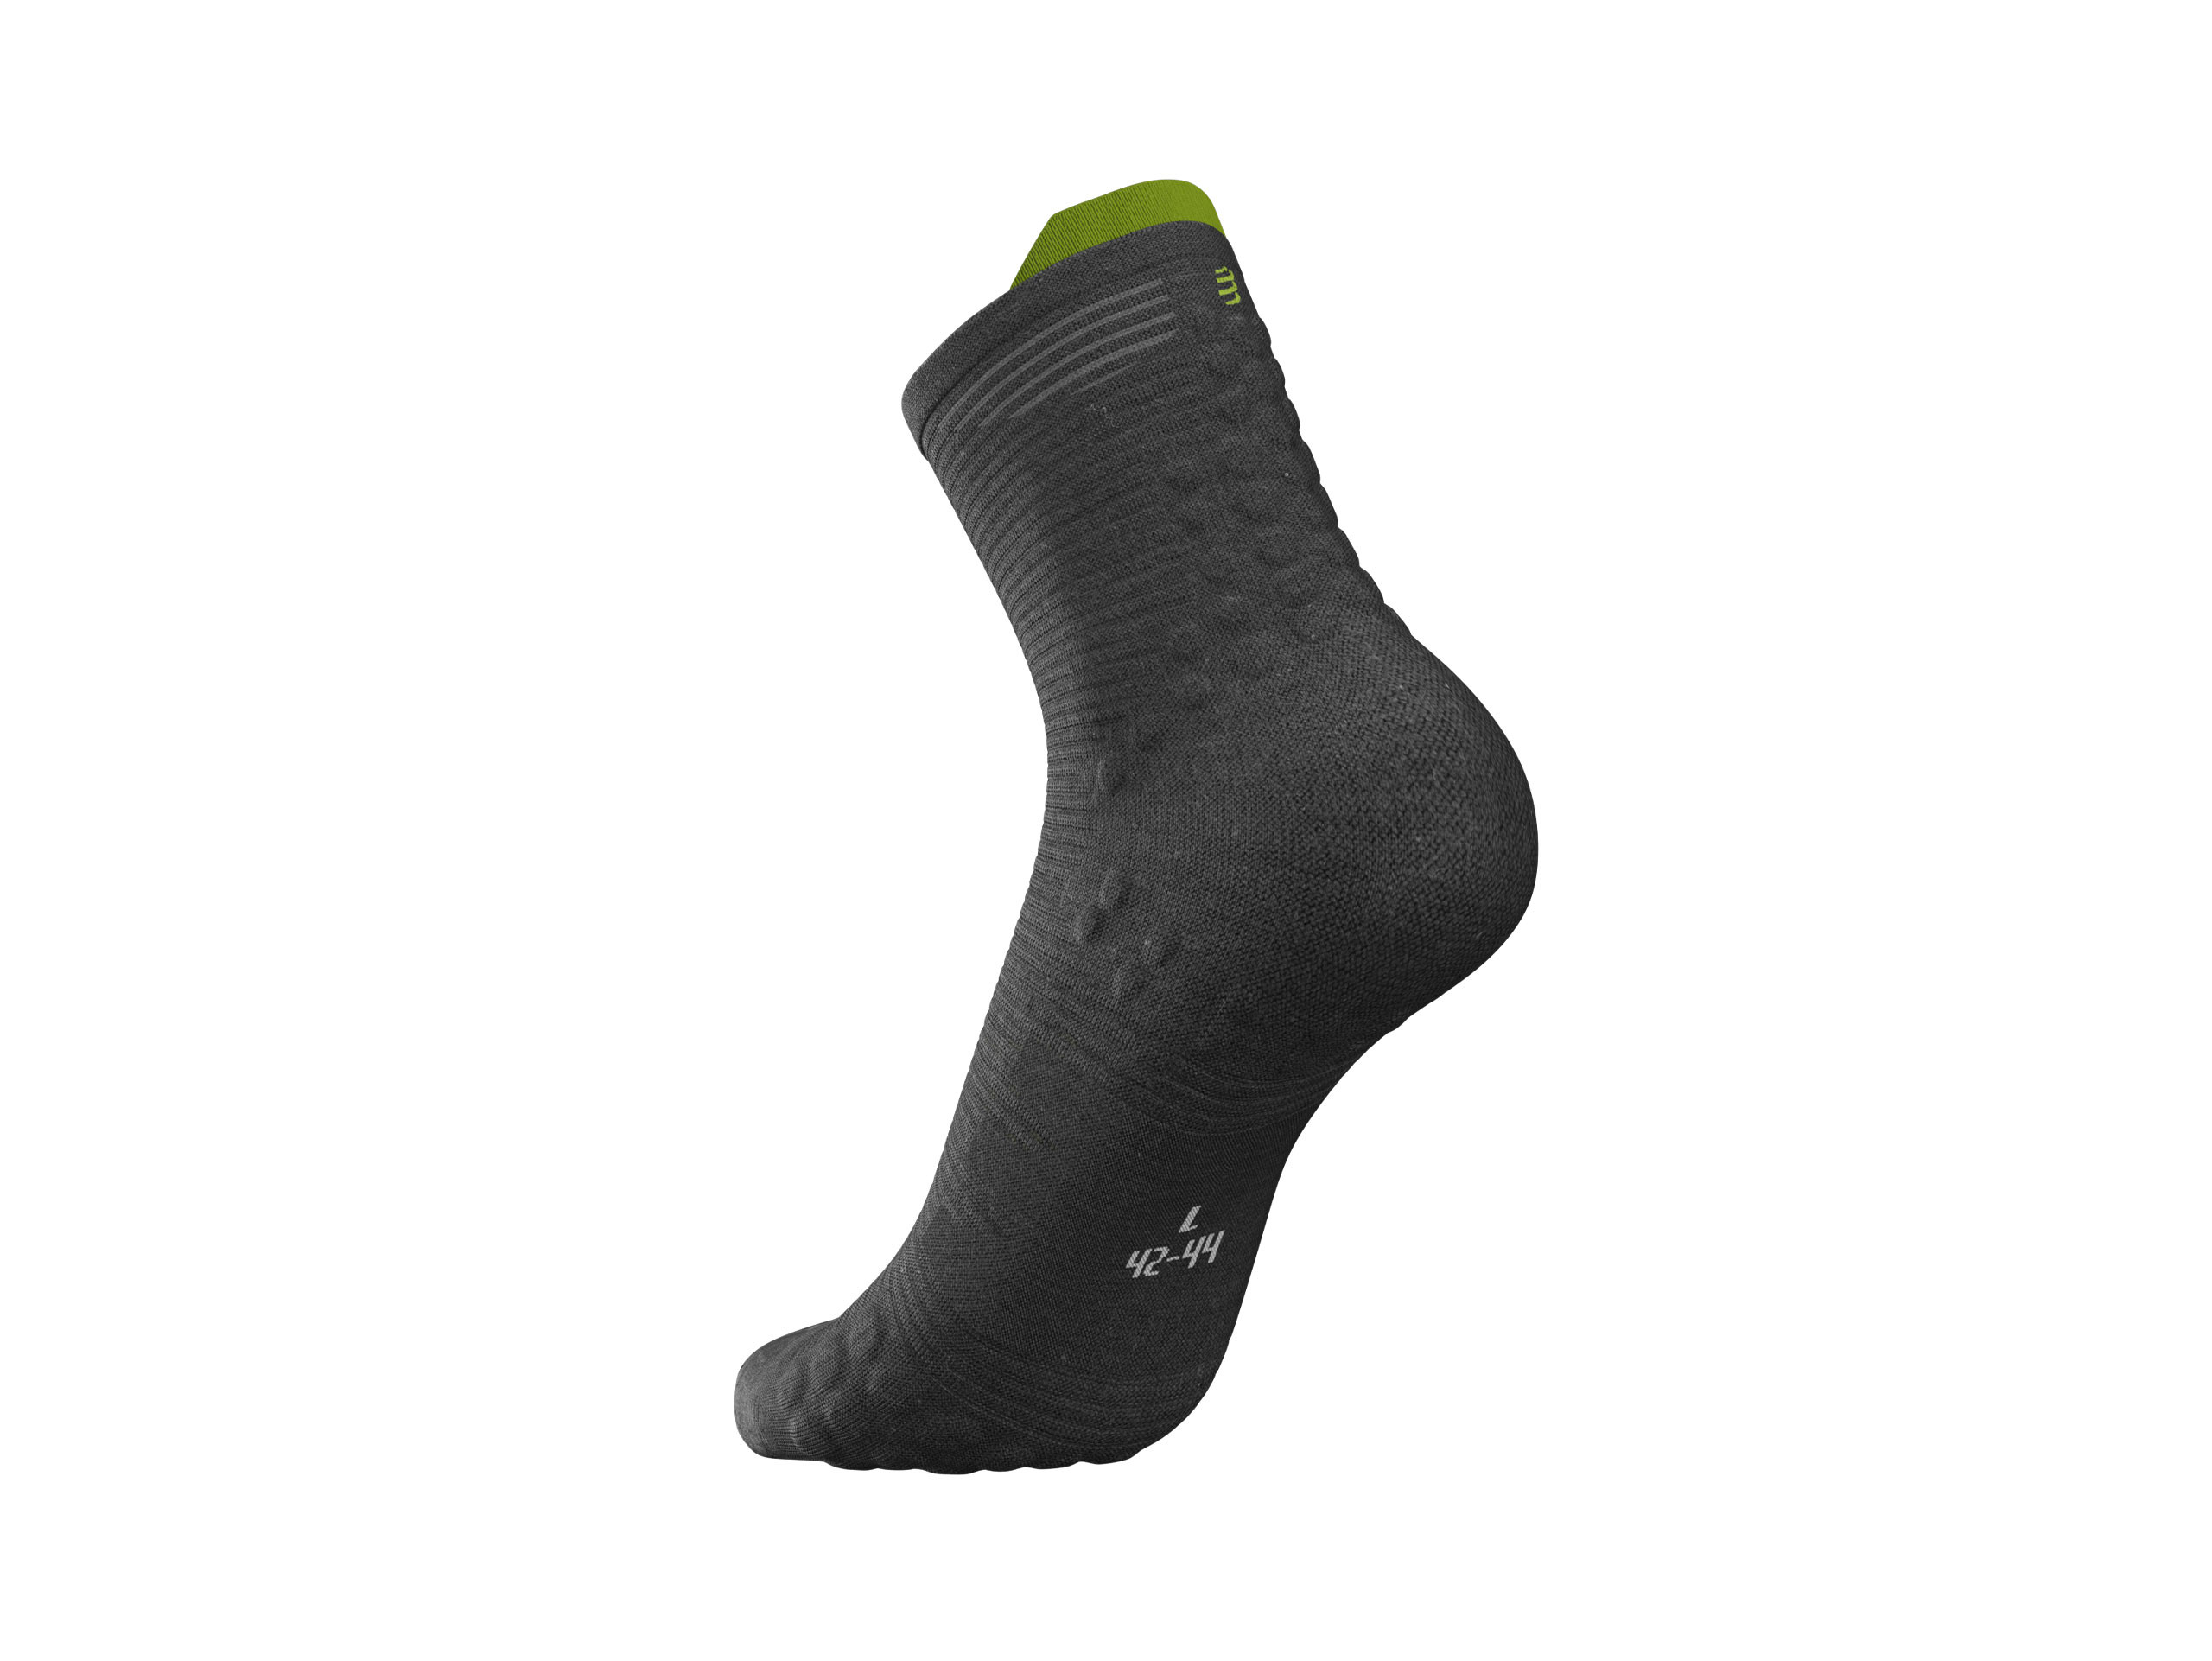 Pro Racing Socks v3.0 Run High - Black Edition 2019